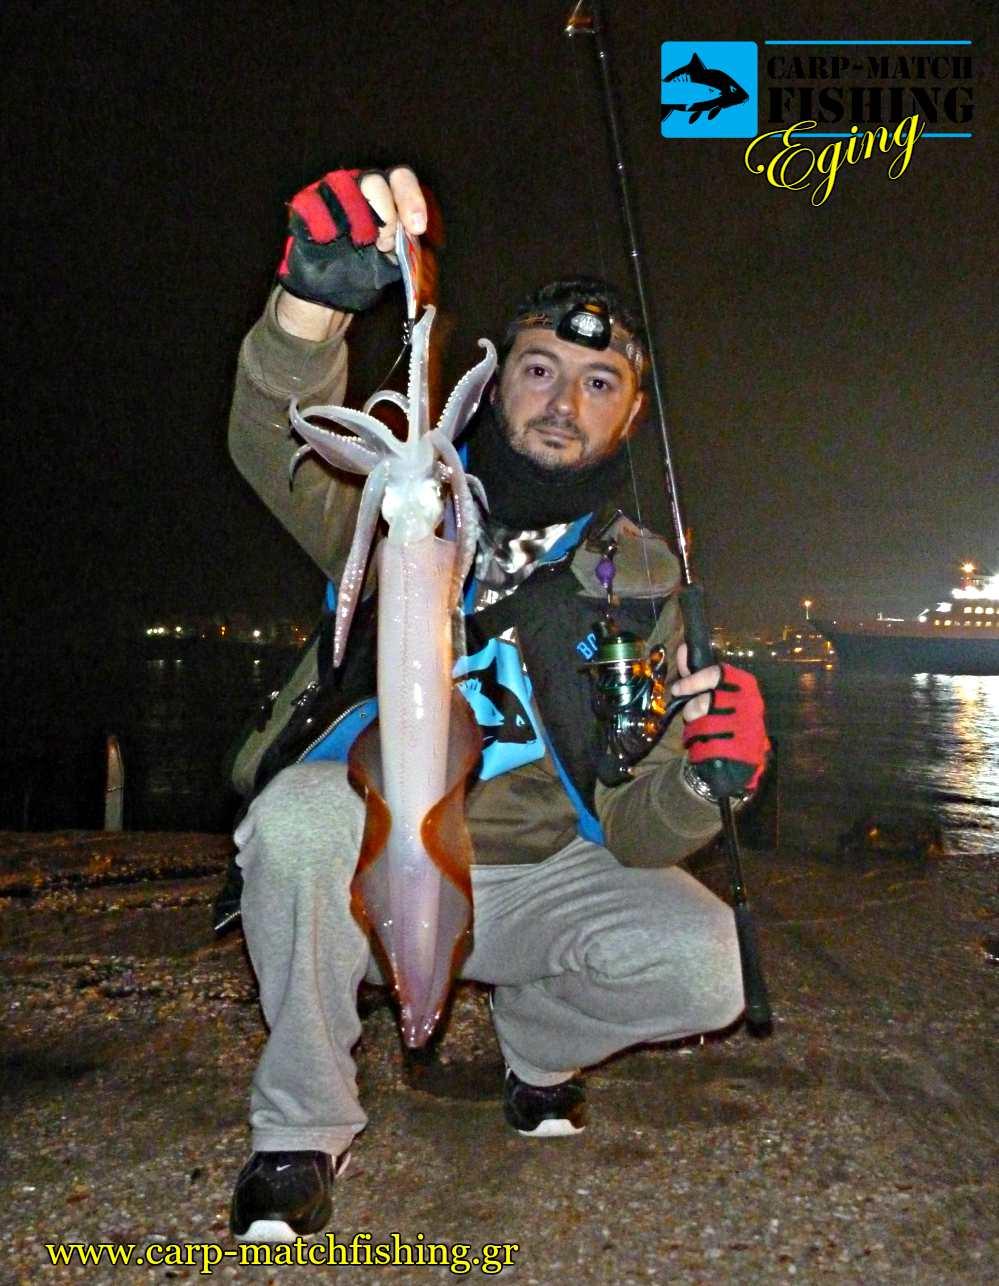 limania topoi kalamarion squid areas carpmatchfishing sfaltos